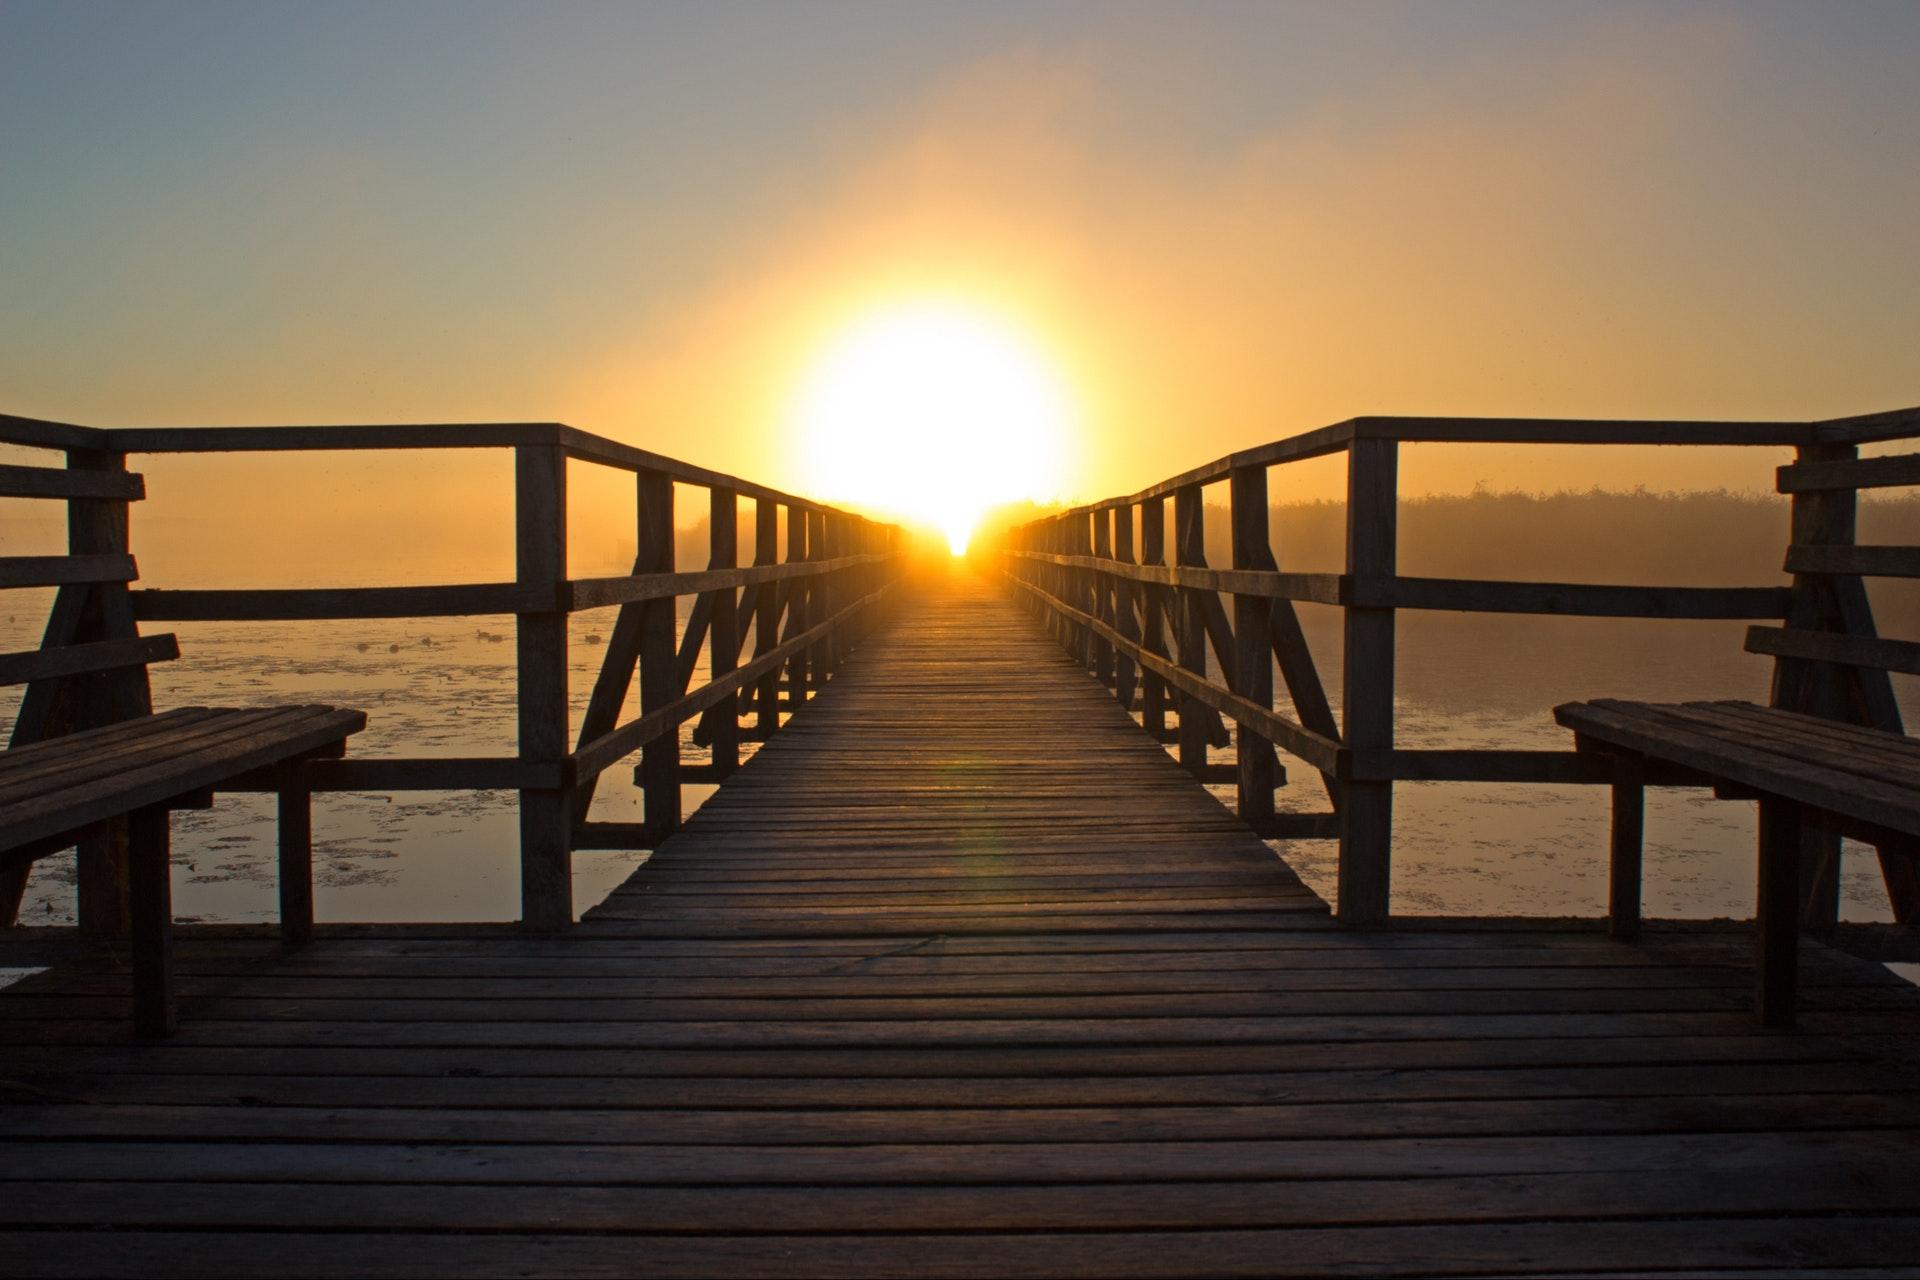 beach-bench-boardwalk-276259 (1)